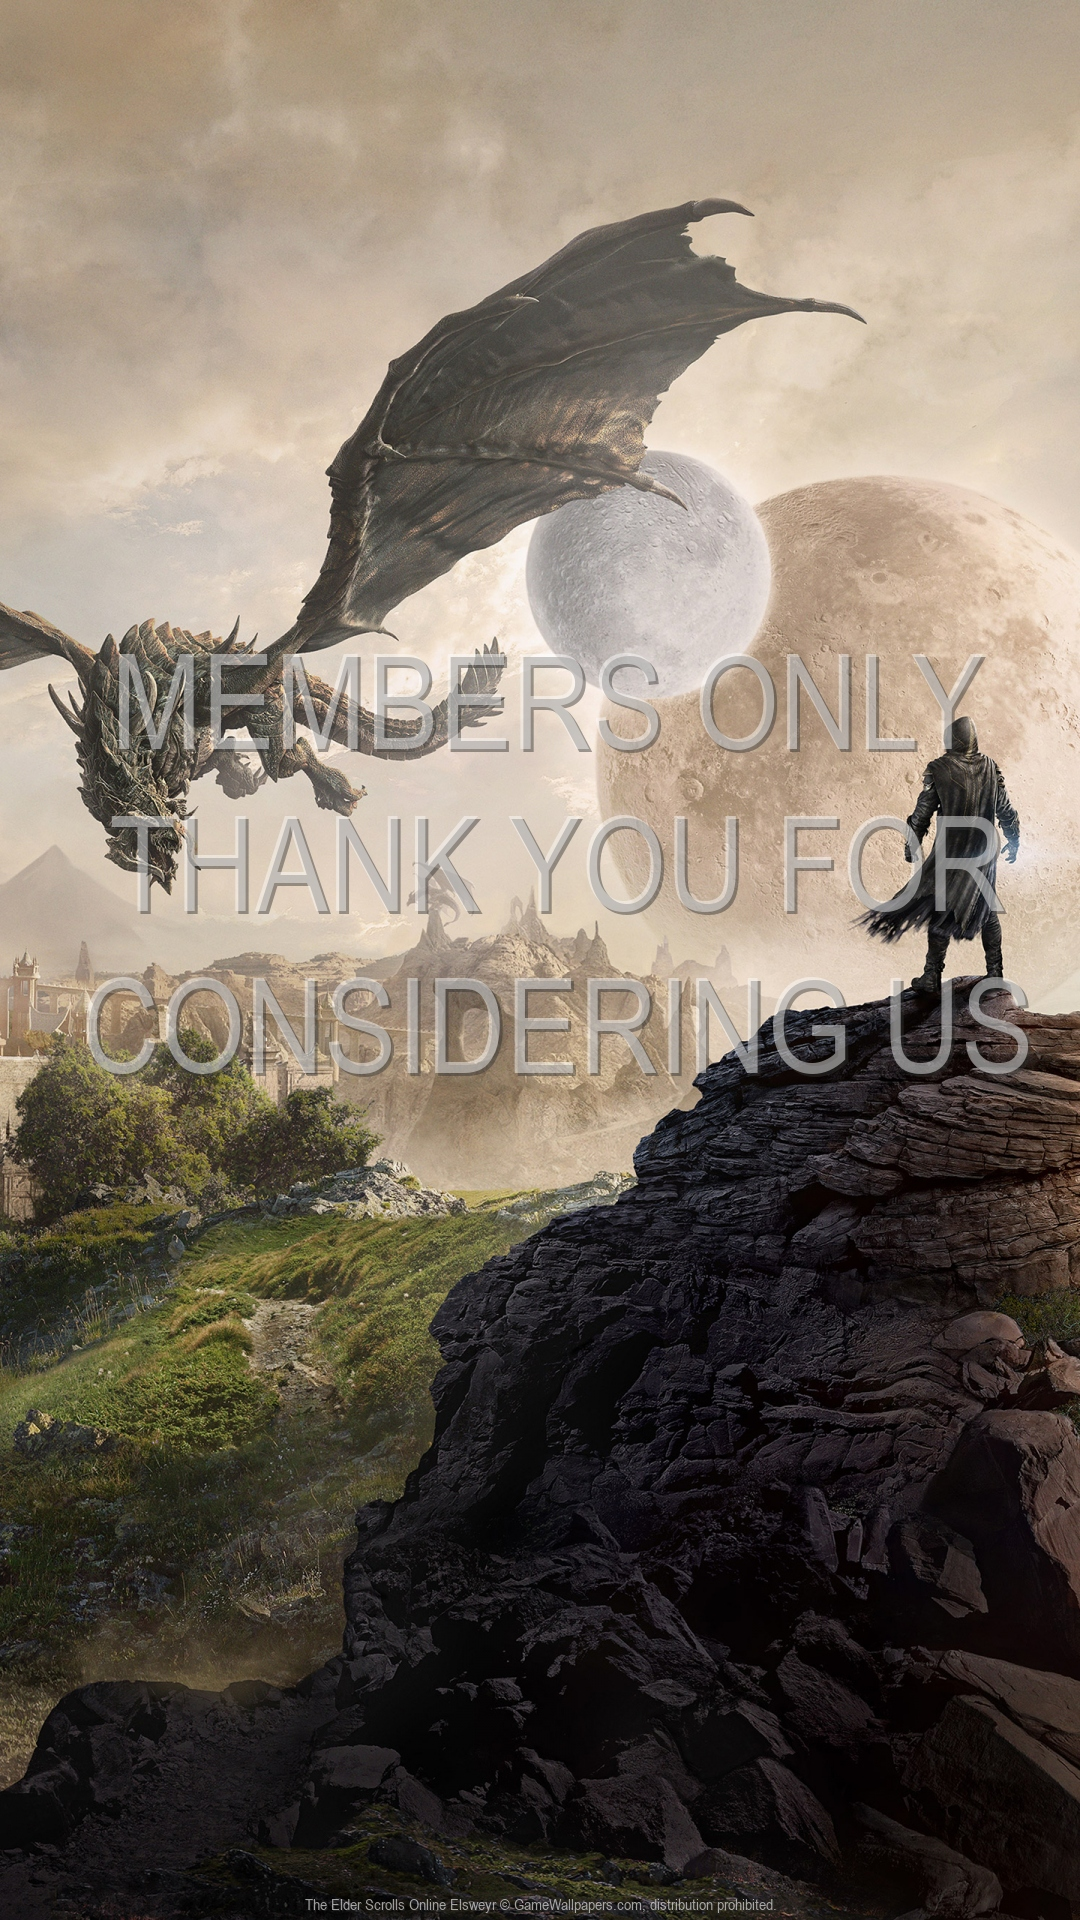 The Elder Scrolls Online: Elsweyr 1920x1080 Mobile wallpaper or background 01